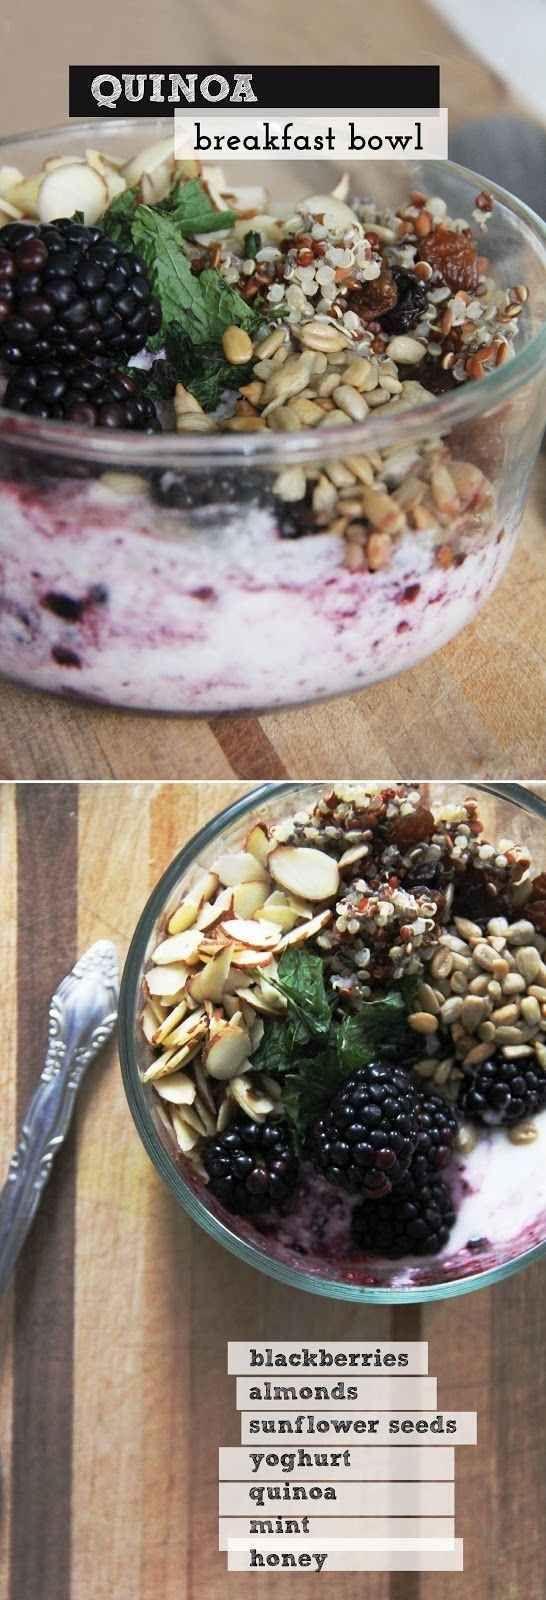 Quinoa Breakfast Bowl | 24 Delicious Ways To Eat Quinoa For Breakfast #breakfast #recipes #brunch #recipe #morning